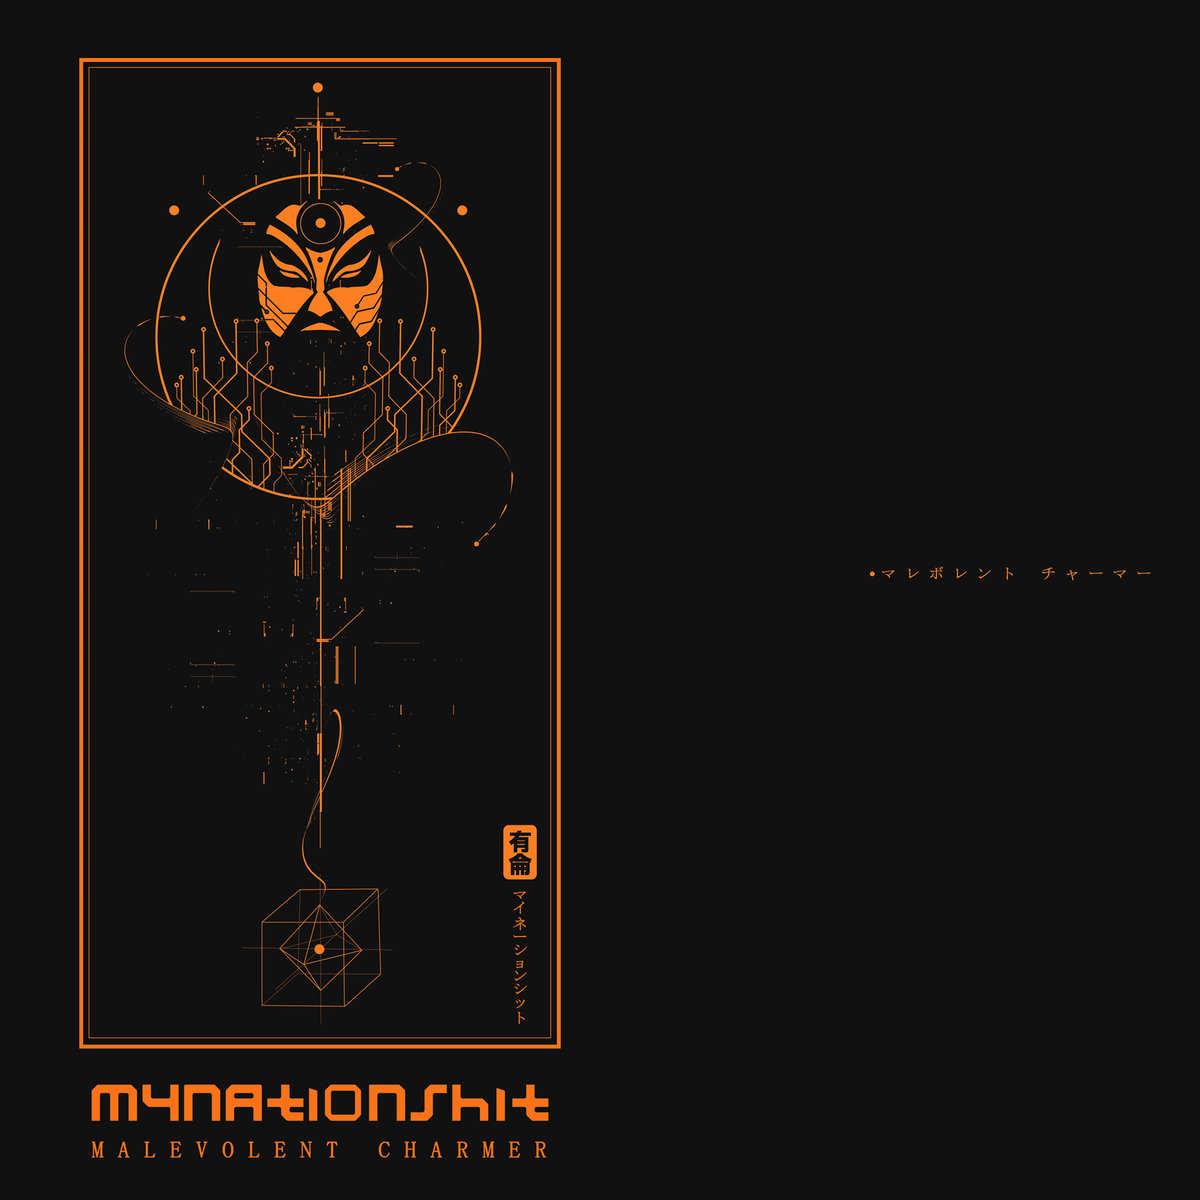 Mynationshit- Malevolent Charmer [Waste Editions] (2016)